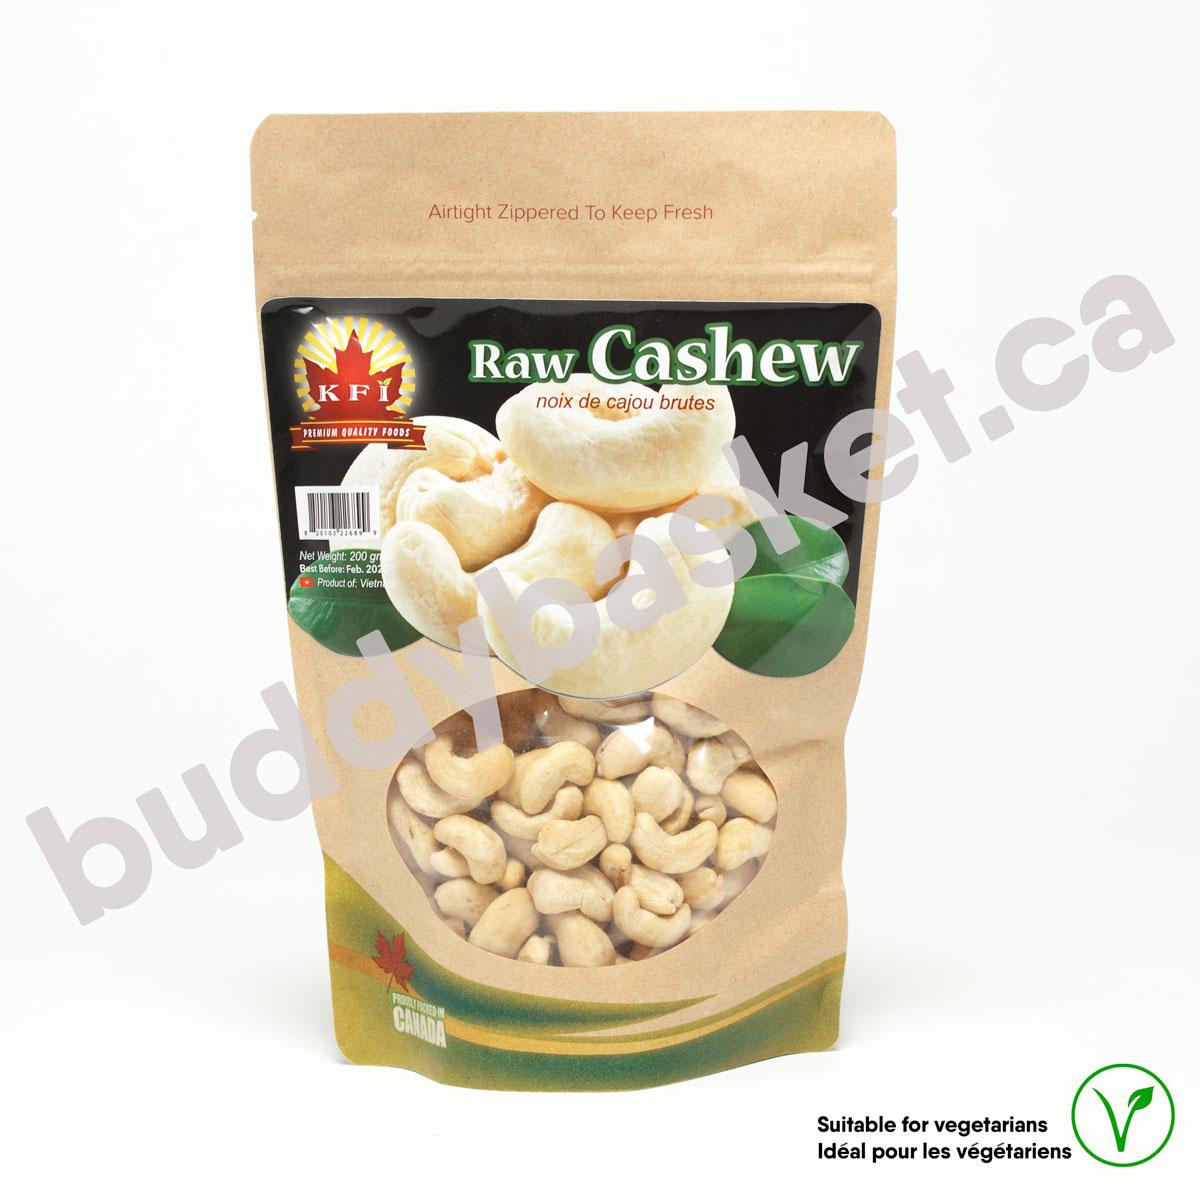 KFI Cashew Raw 400g